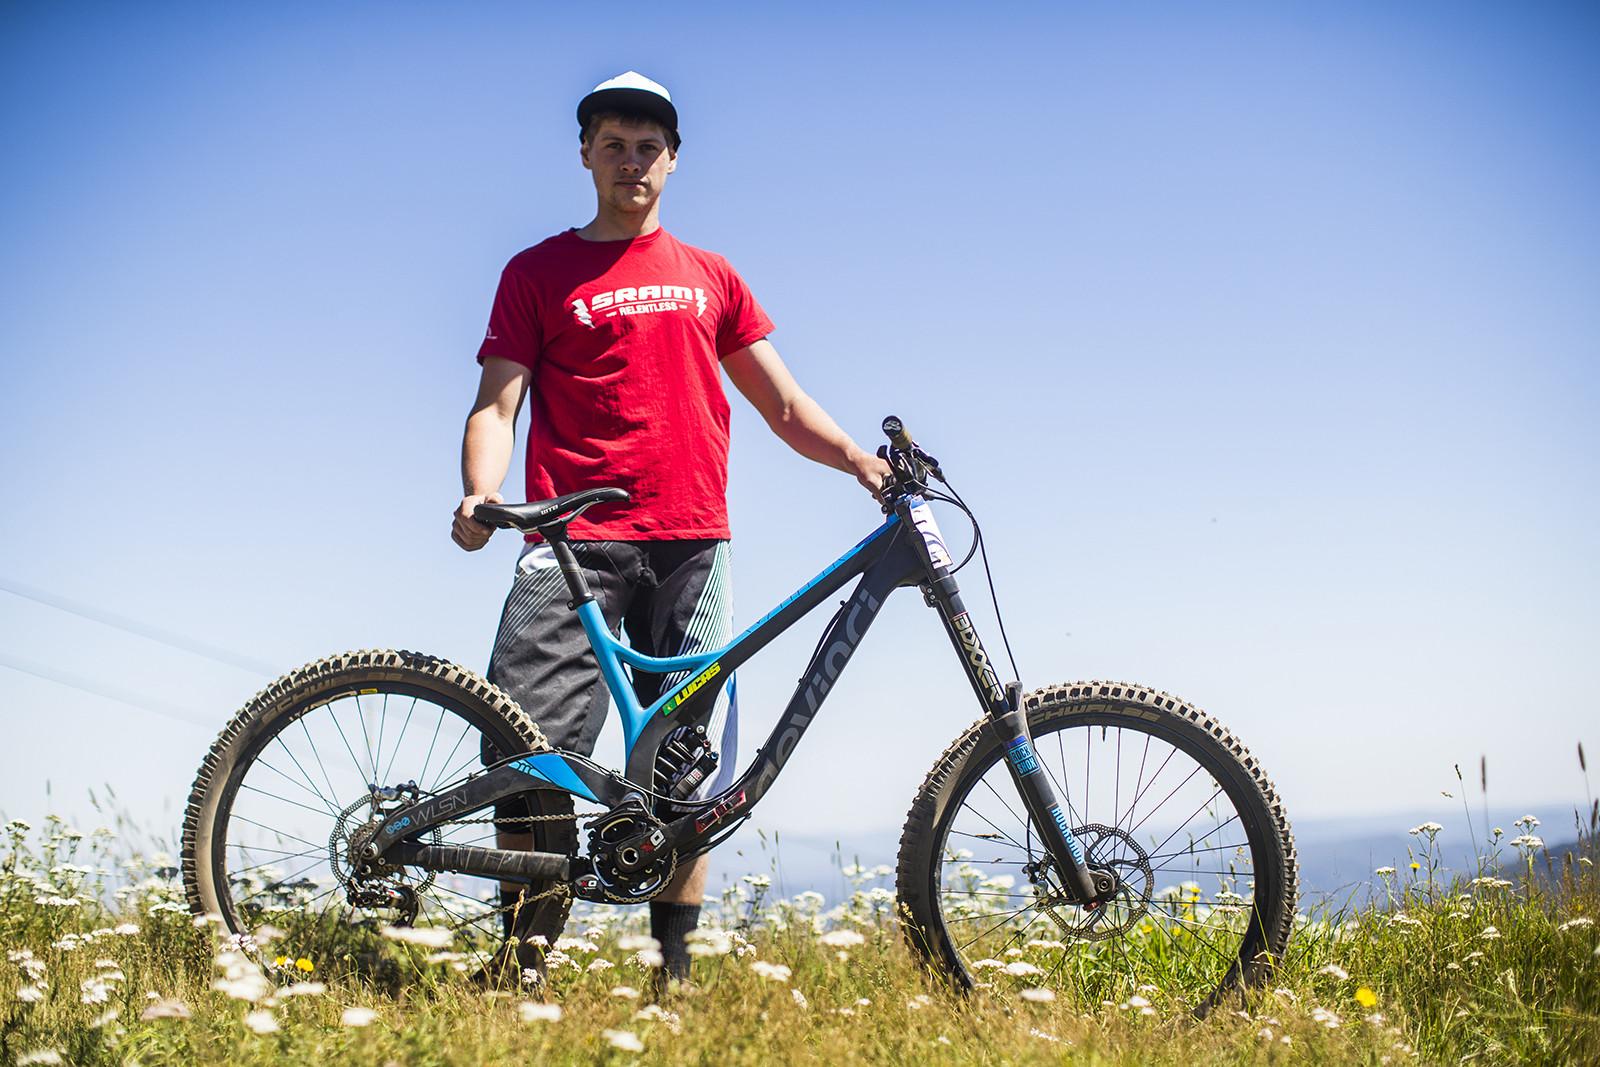 Pro Bike Check: Dean Lucas' Devinci Wilson Carbon - Pro Bike Check: Dean Lucas' Devinci Wilson Carbon - Mountain Biking Pictures - Vital MTB